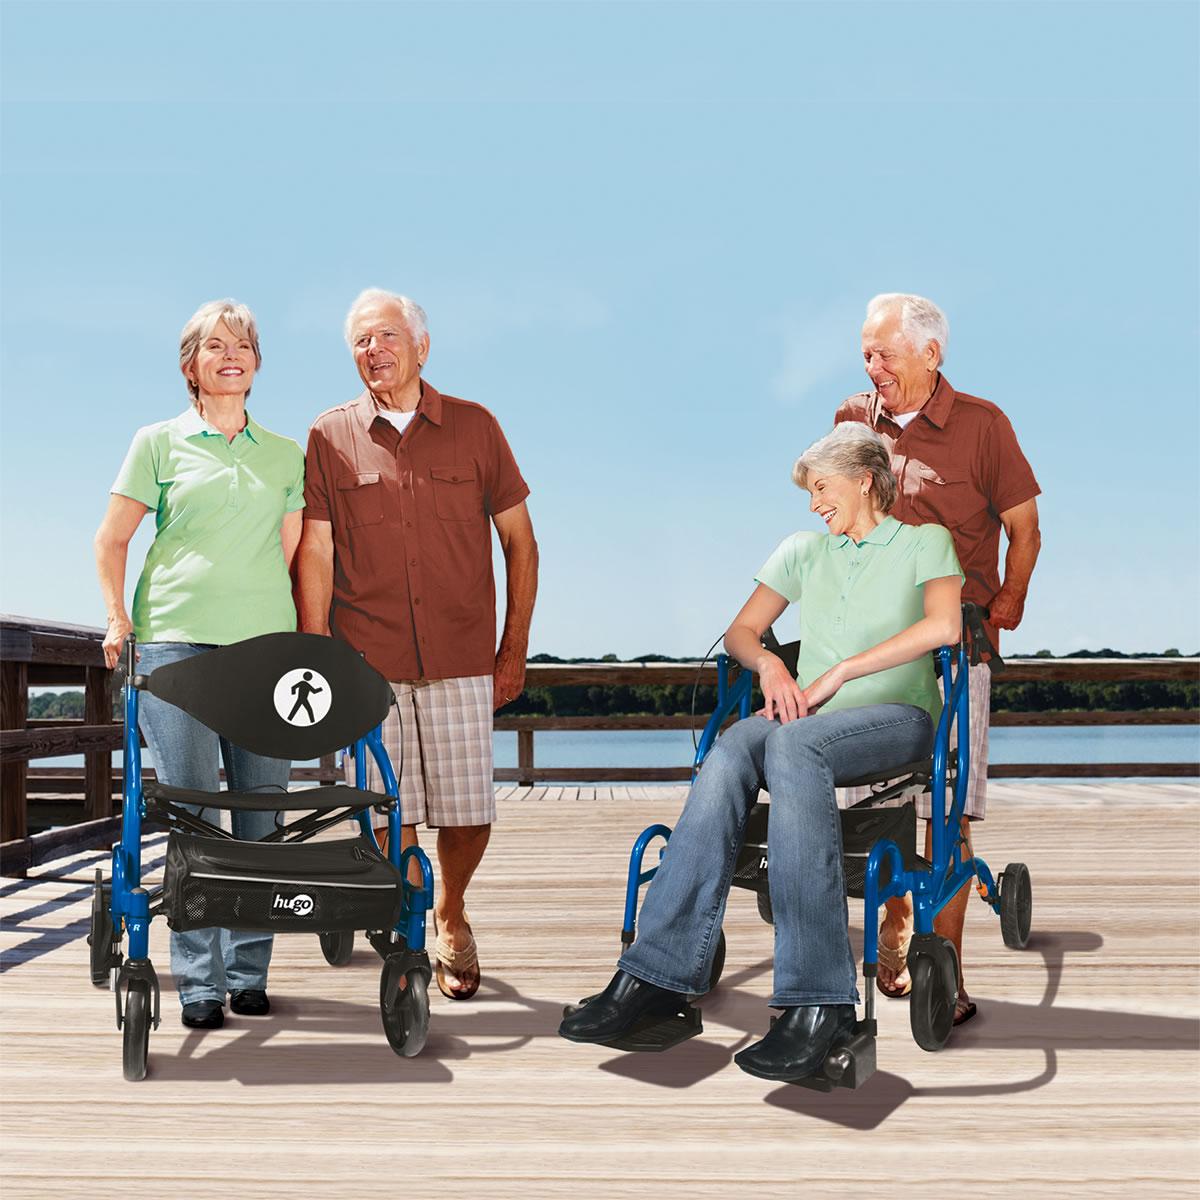 walker transport chair in one hugo navigator sitting exercises seniors rollator and  mobility